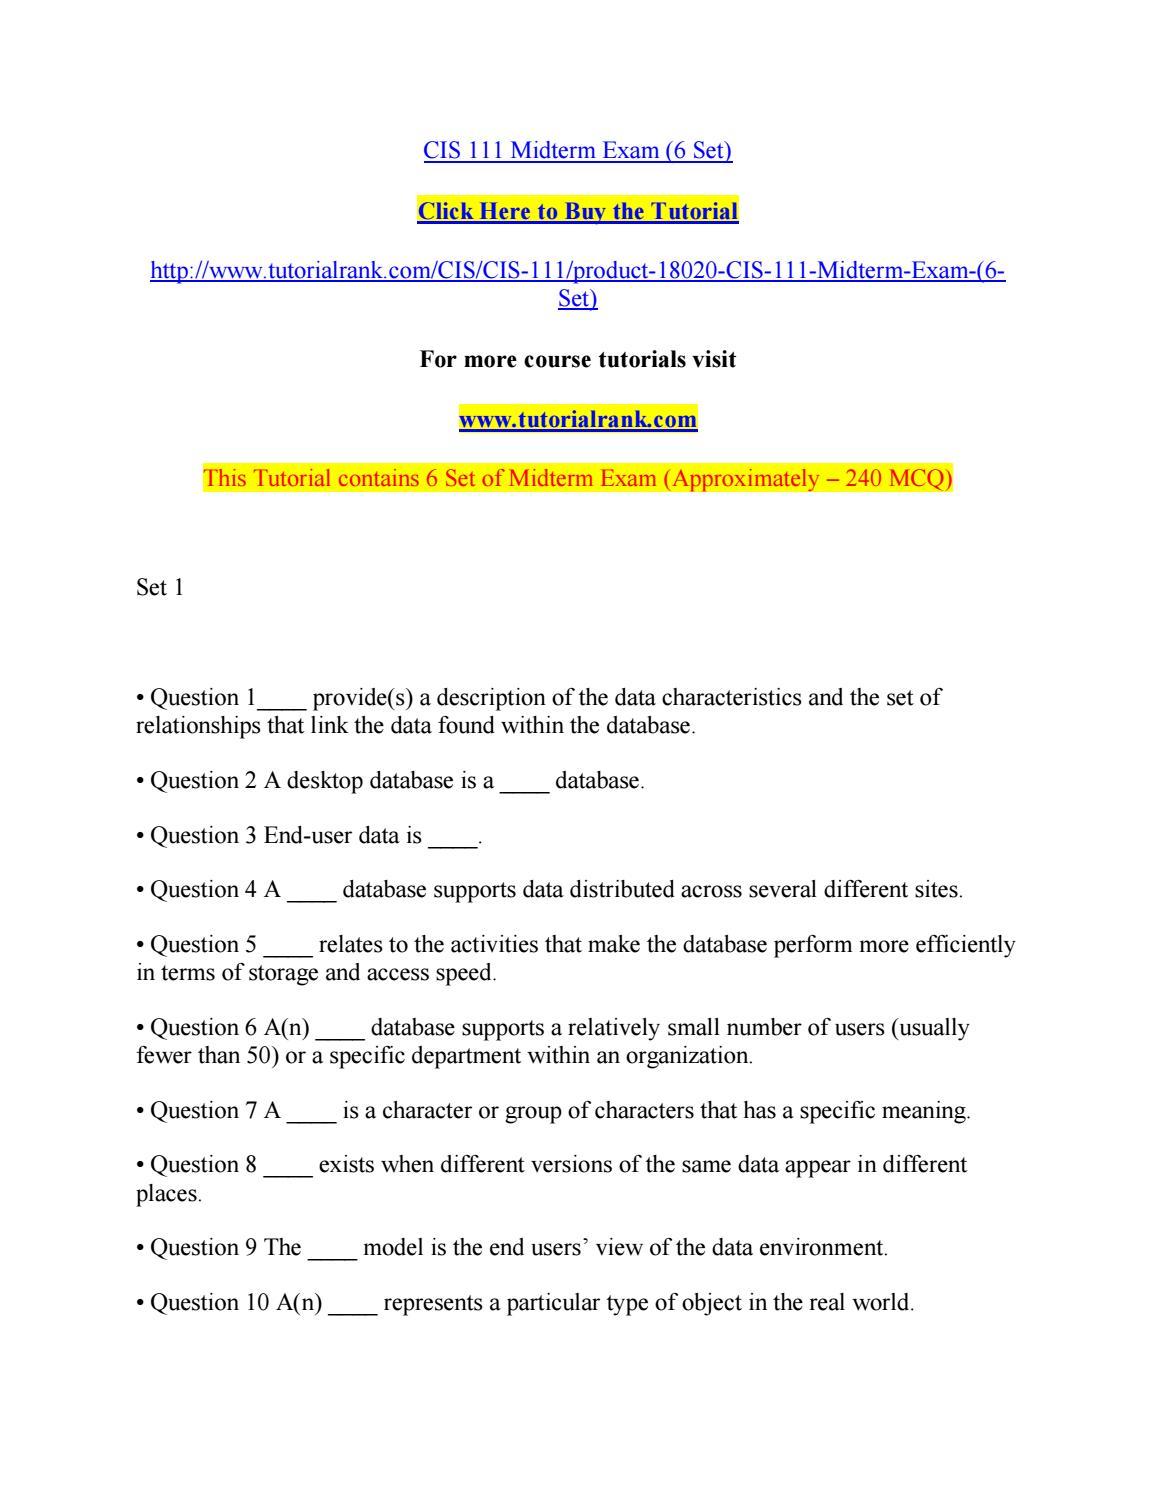 An analysis of midterm examination